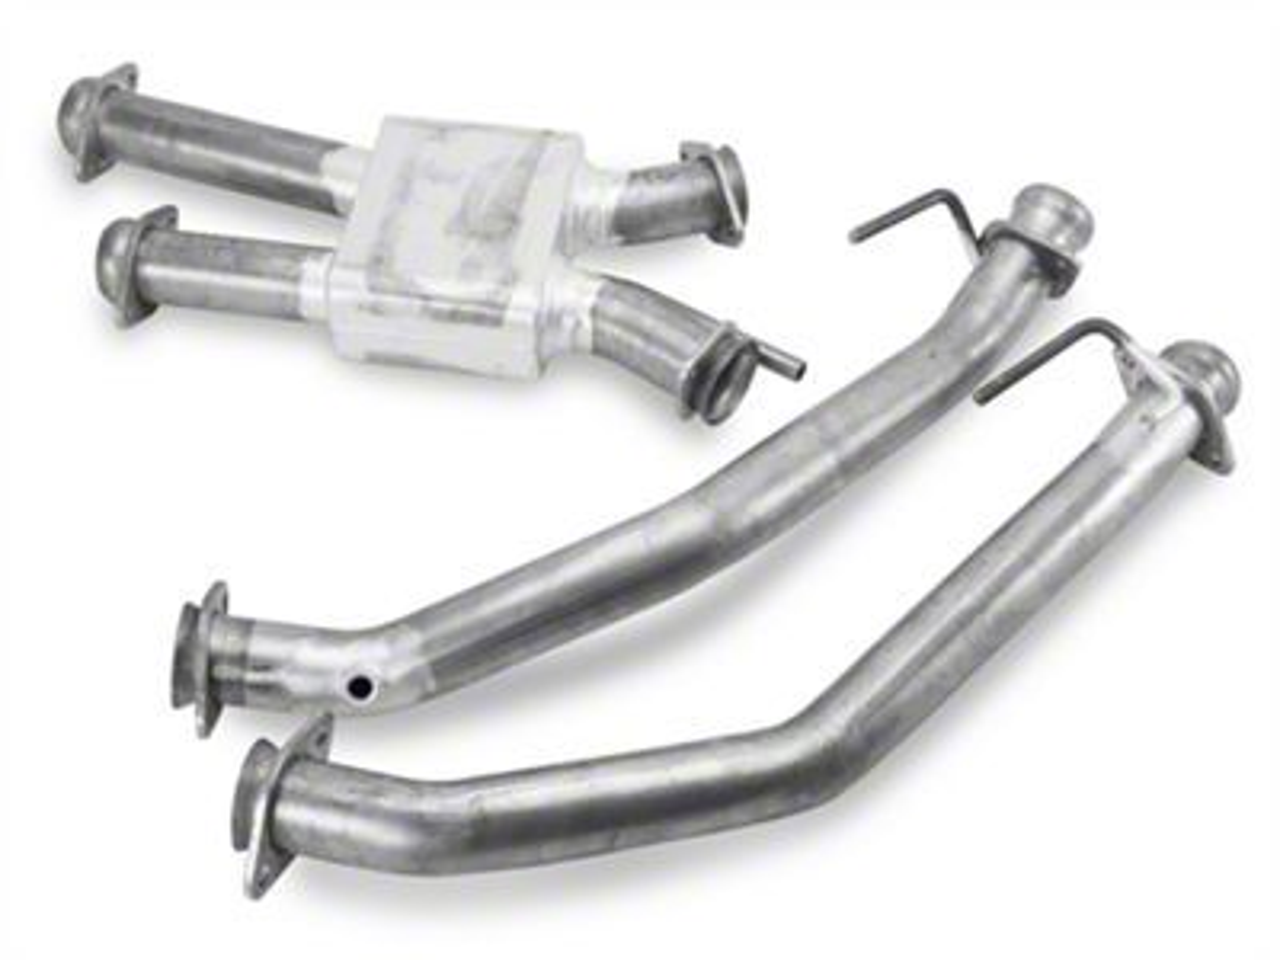 MAC Off-Road Pro Chamber Mid Pipe (79-93 5.0L)